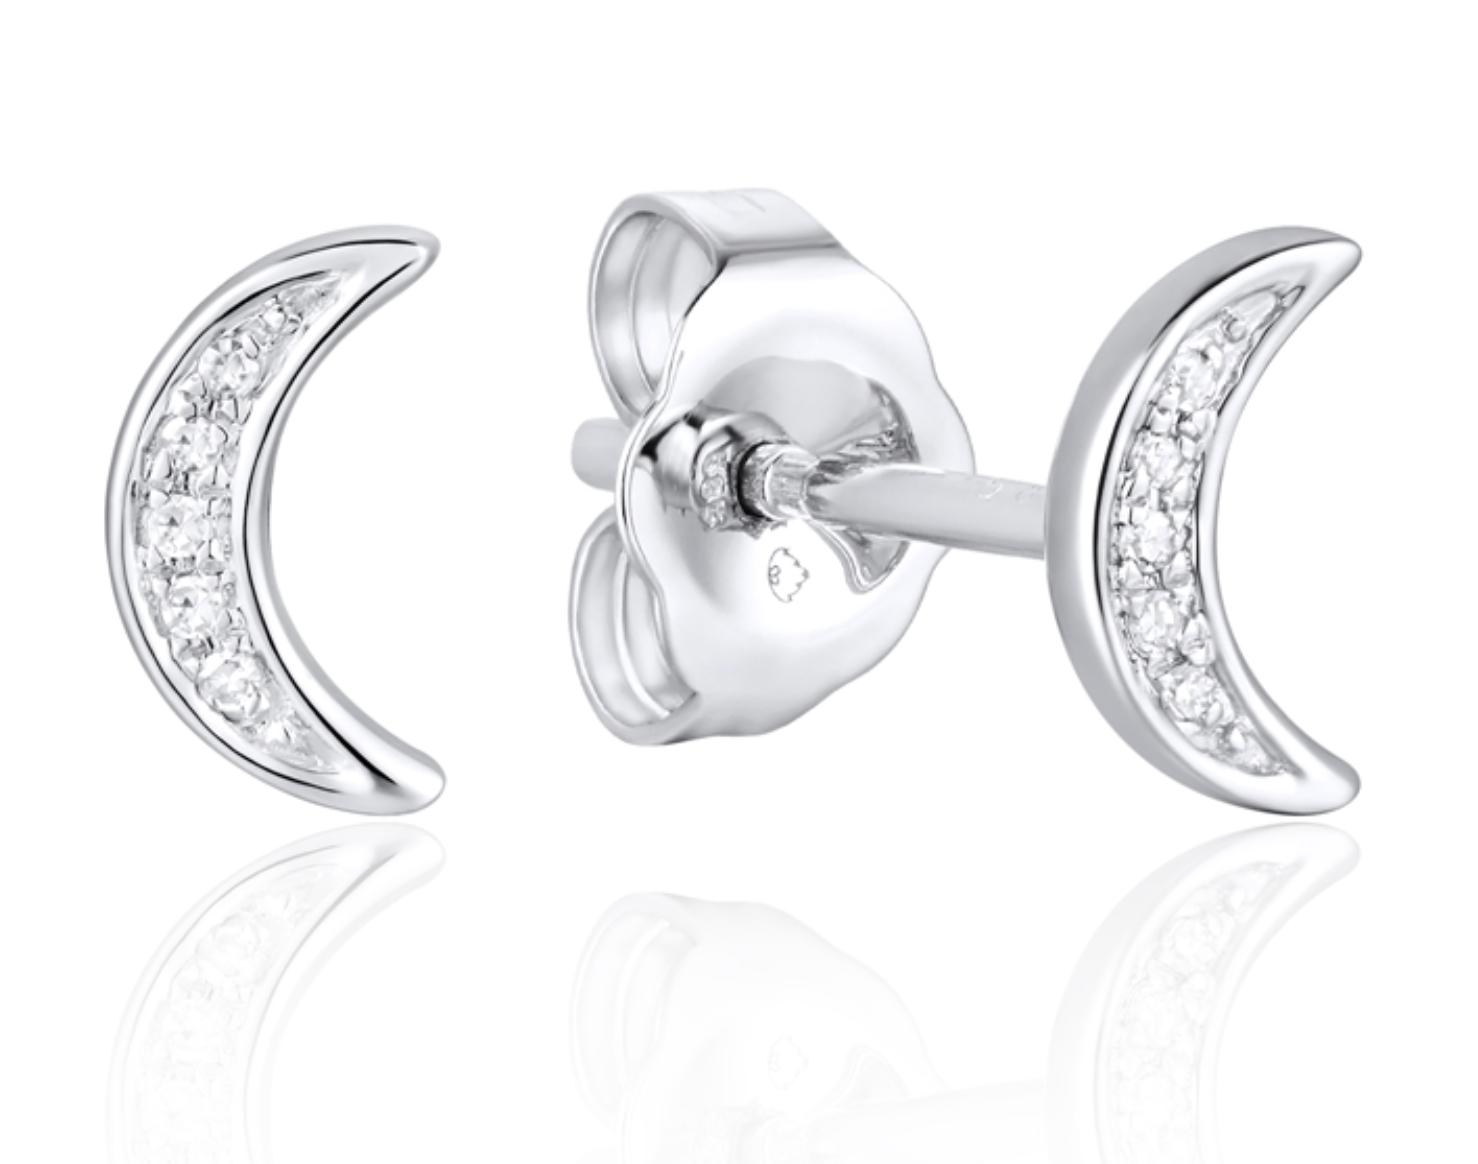 Luvente White Gold Diamond Pave Moon Earring